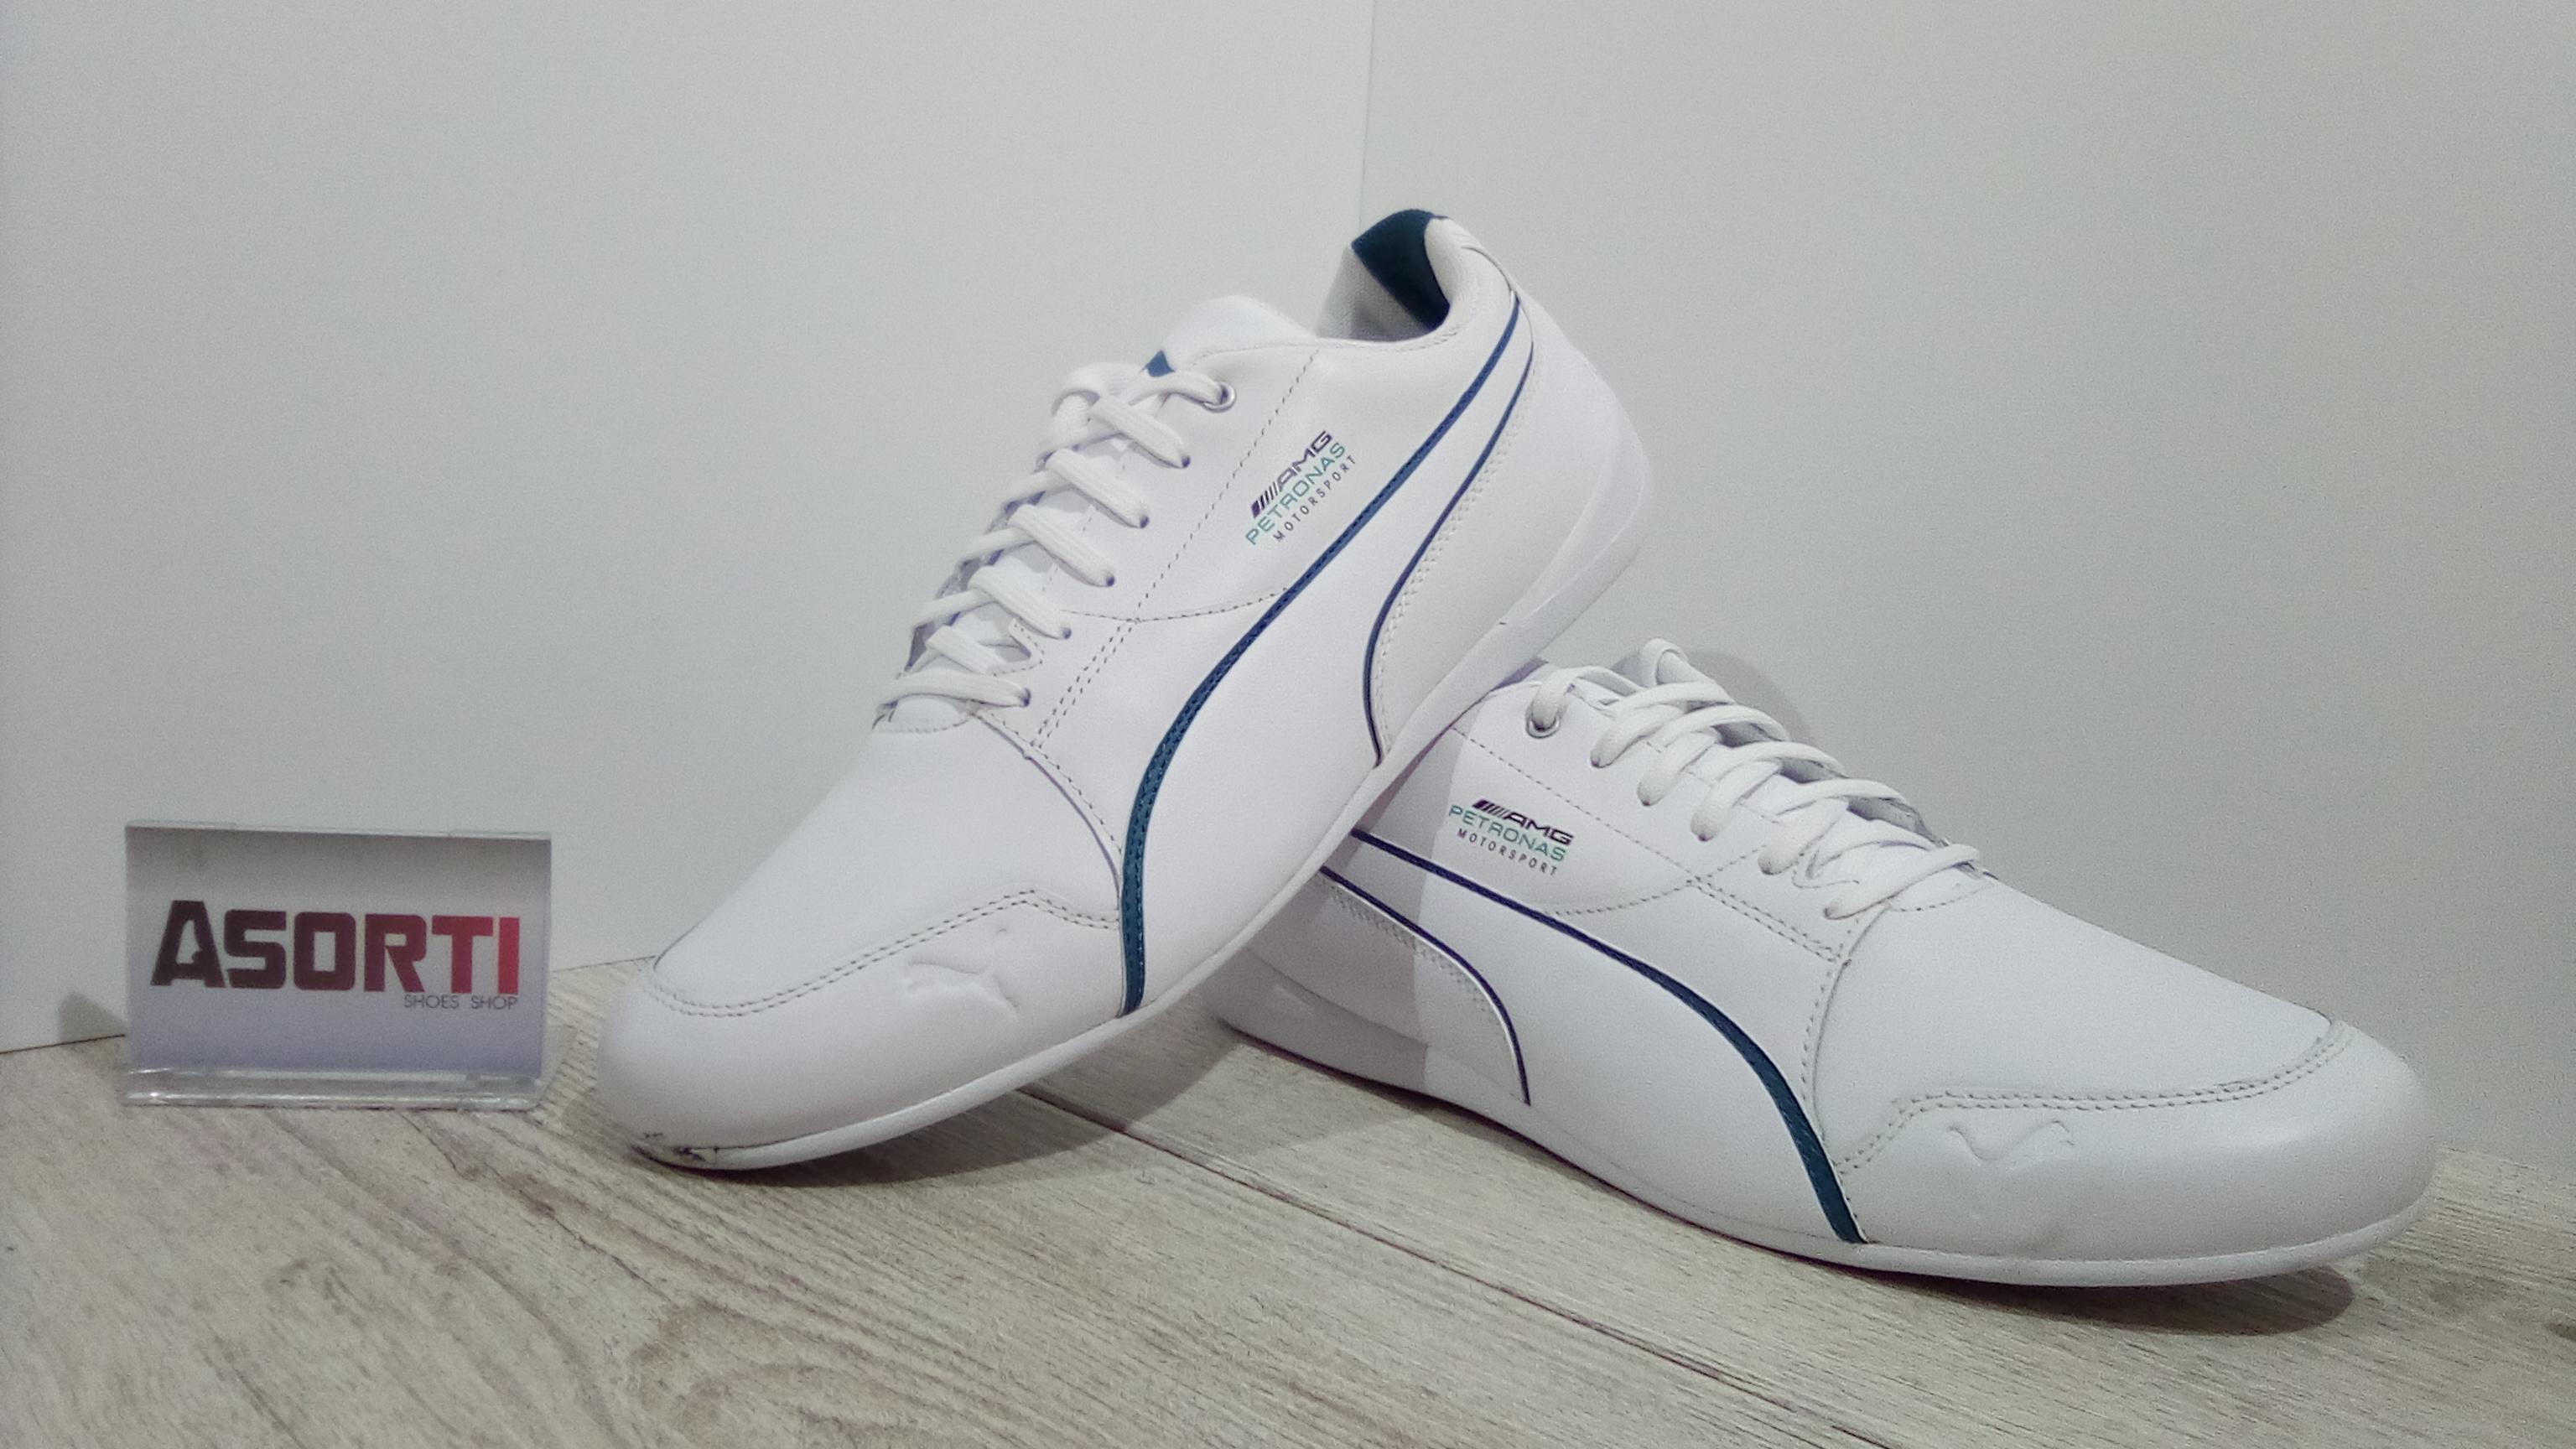 1c3974be Мужские кроссовки Puma Mercedes Motorsport Drift Cat 7 (306150-01) белые